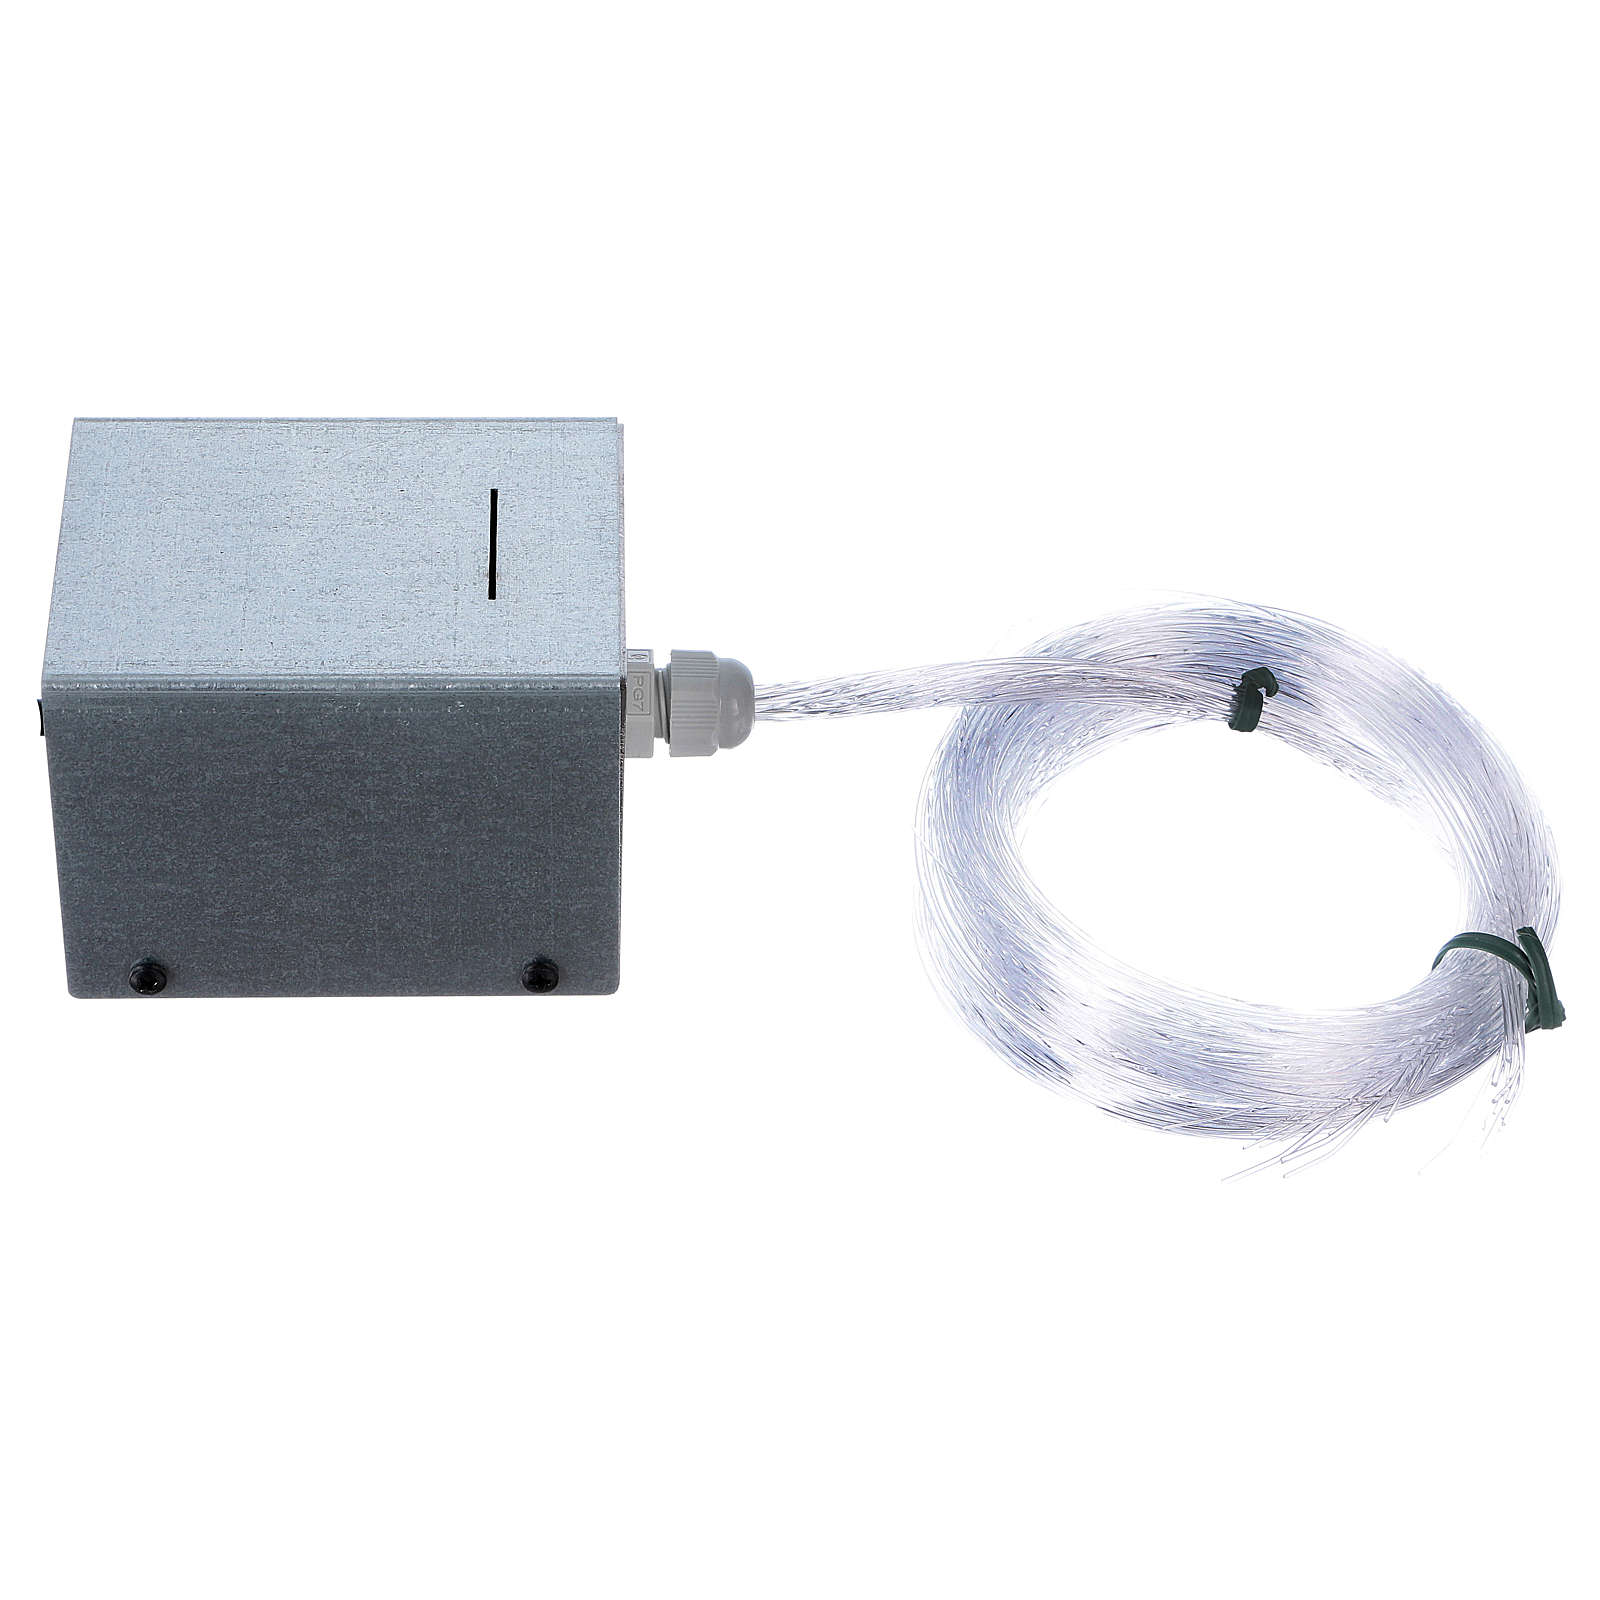 Circuito de control estrellas de fibra óptica Light Filter 50 hilos de diferentes grosores para belén 4